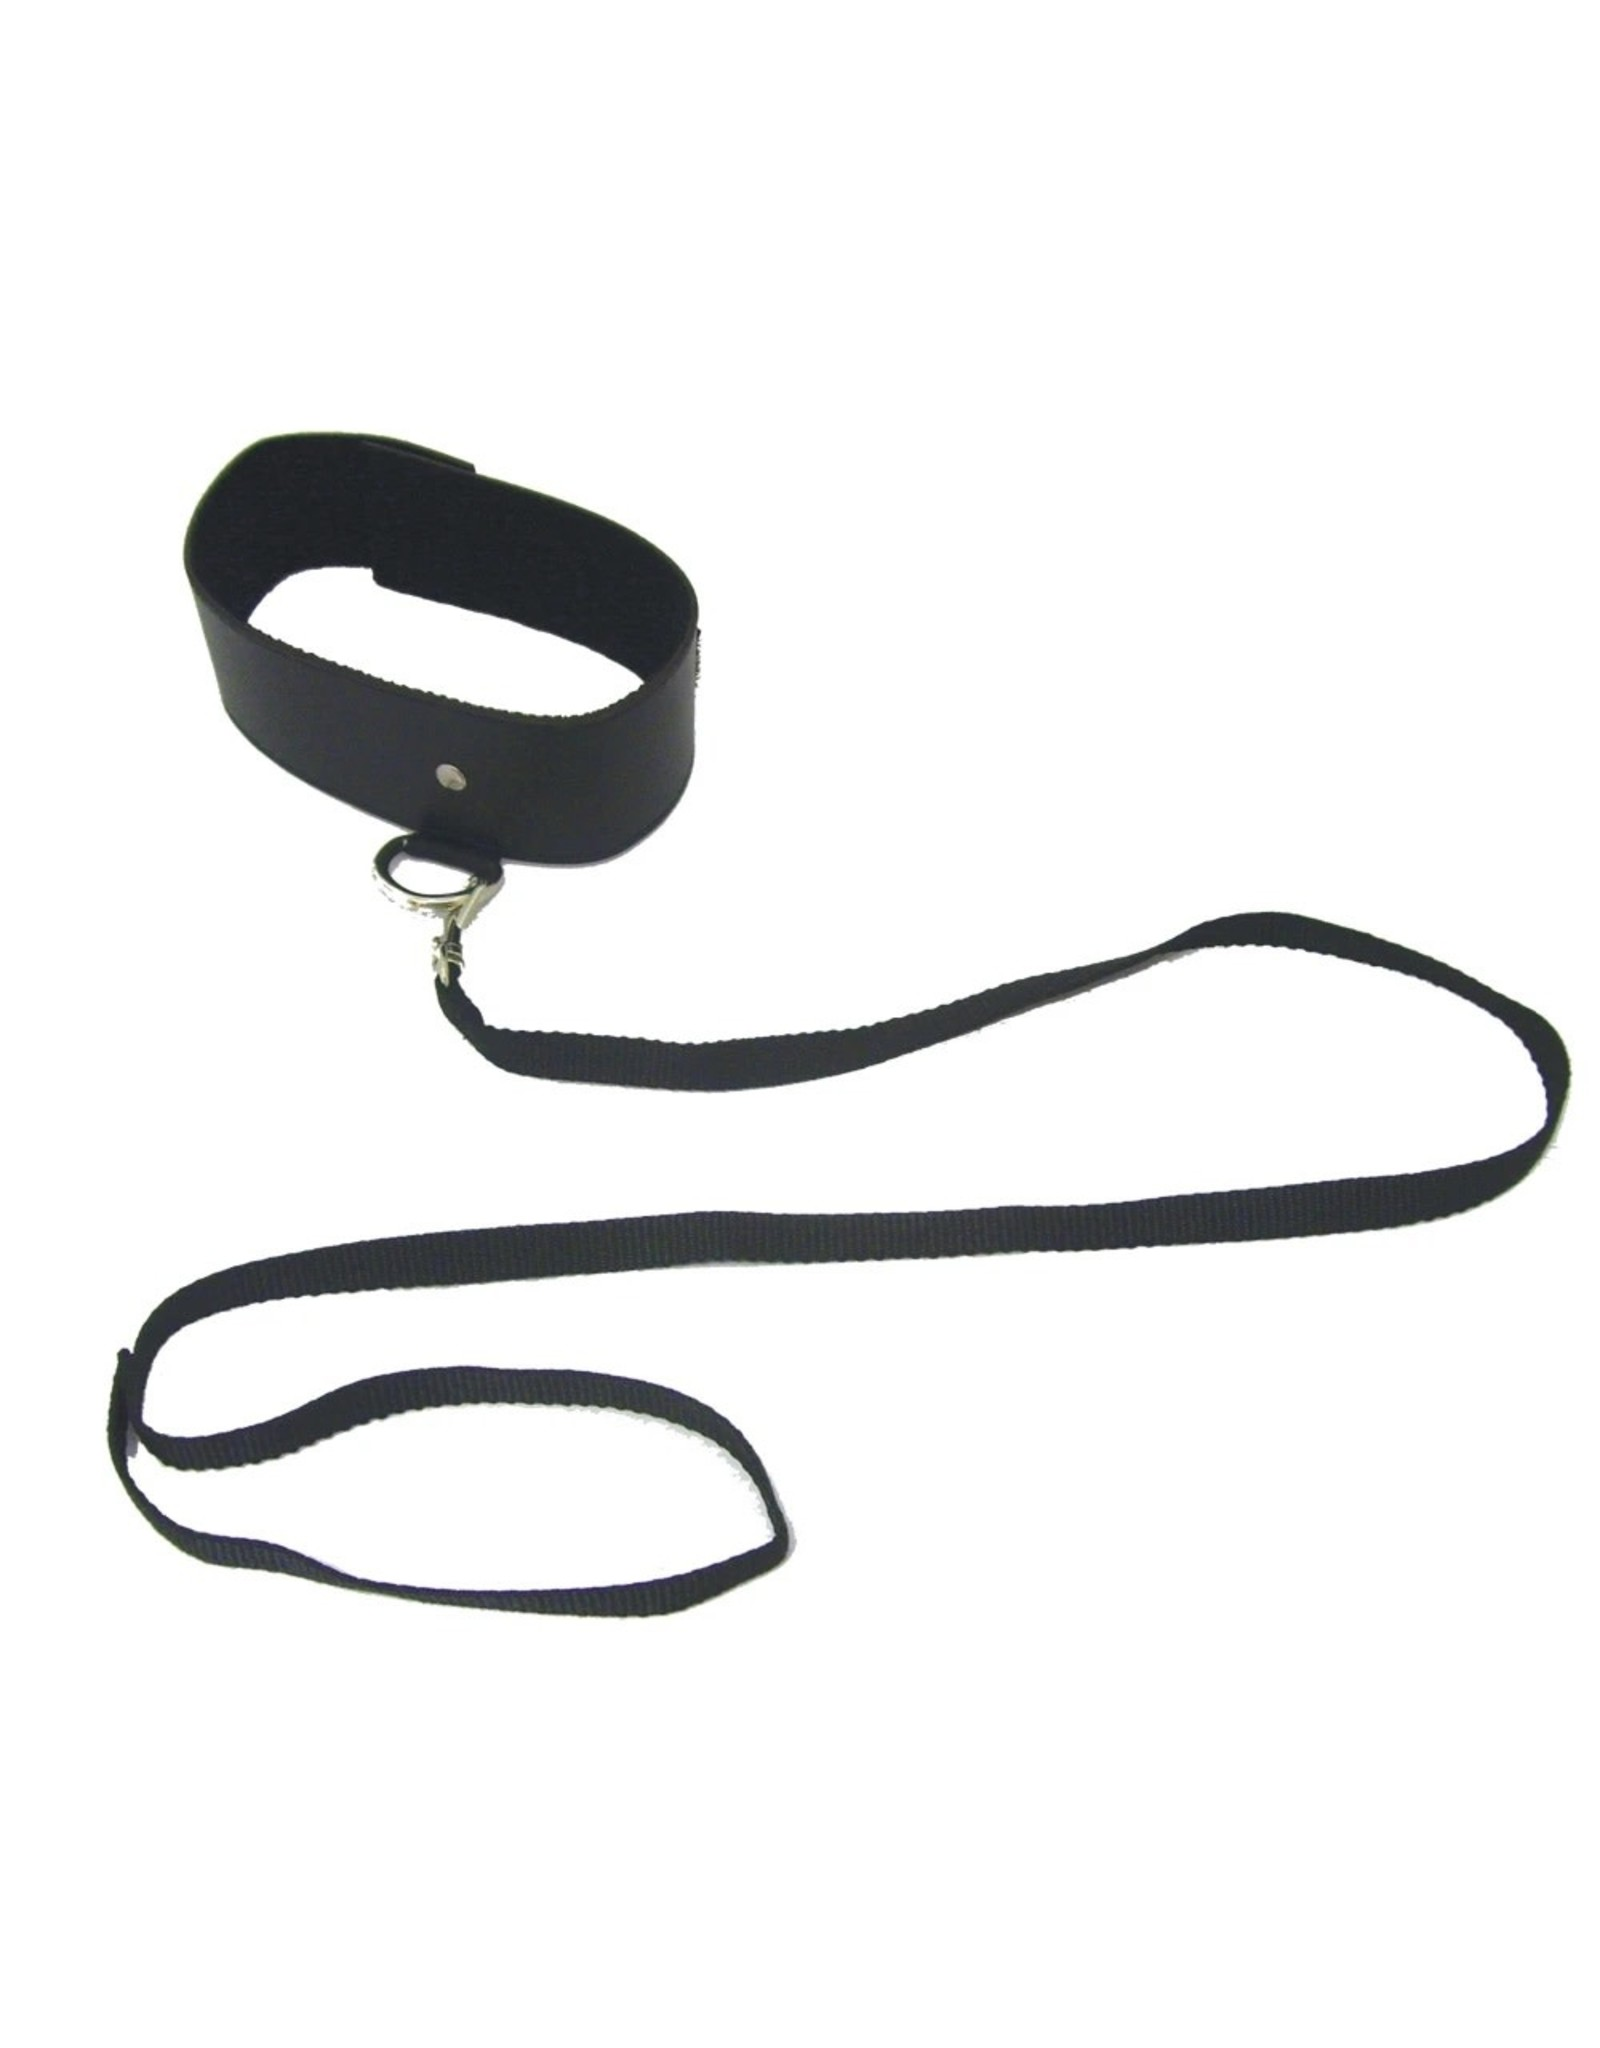 Sportsheets S&M Black Leash and Collar